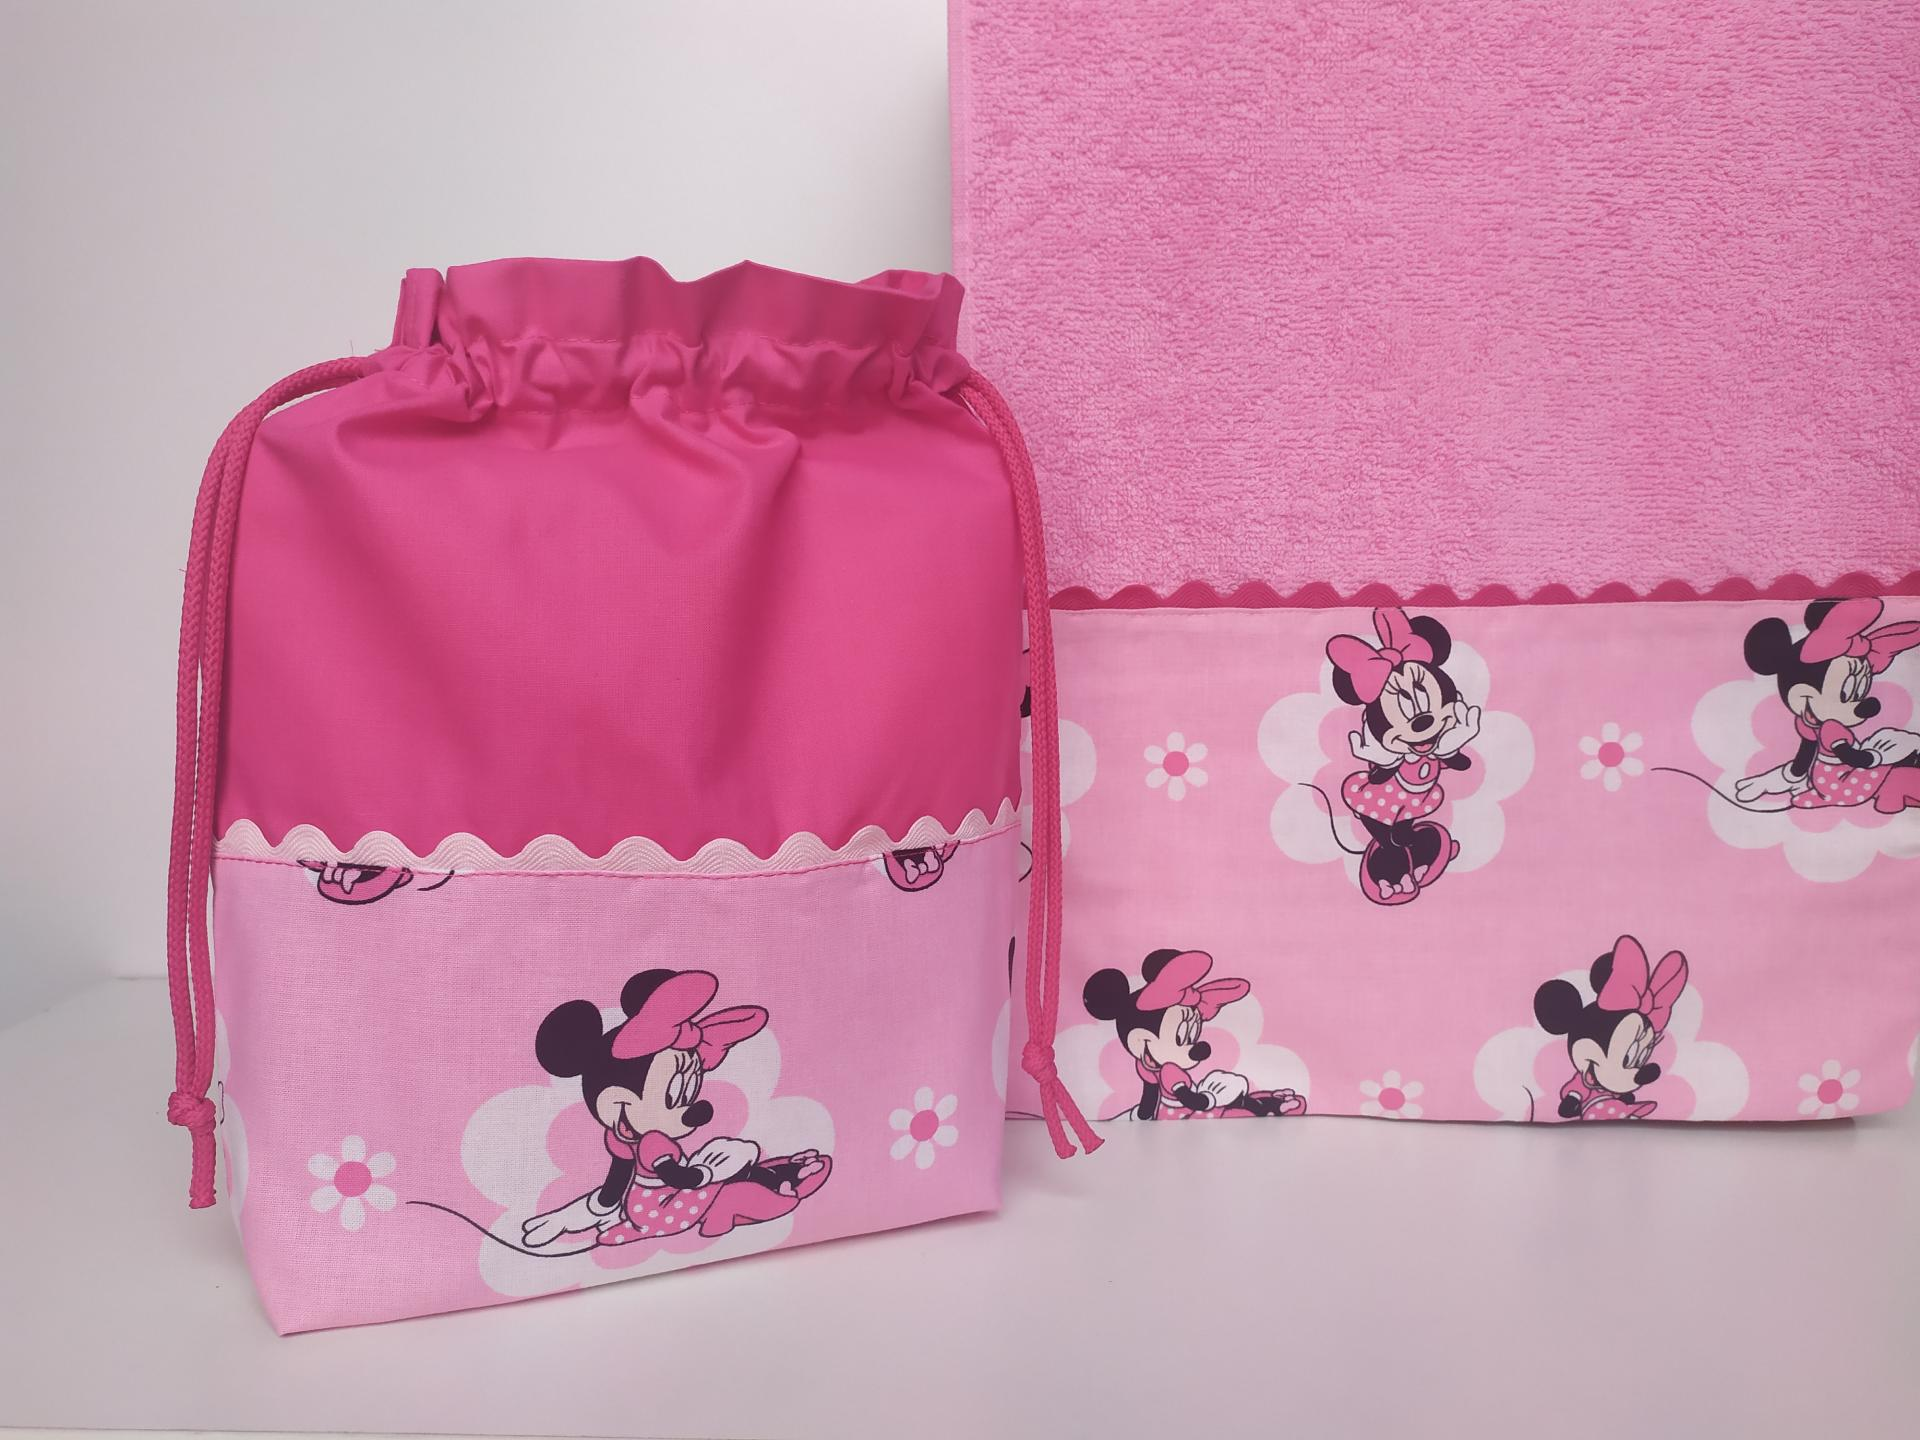 Toalla - Bolsa Minnie Mouse